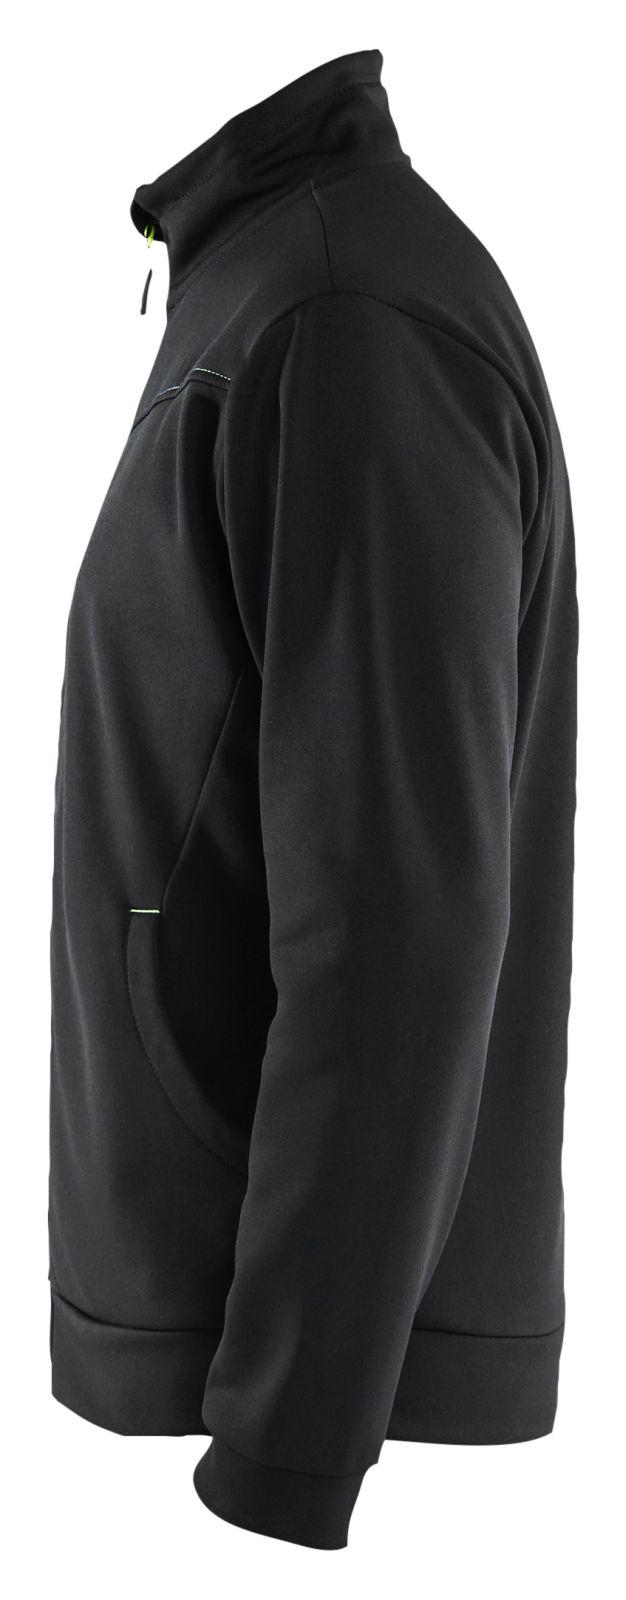 Blaklader Vesten 33622526 zwart-geel(9933)